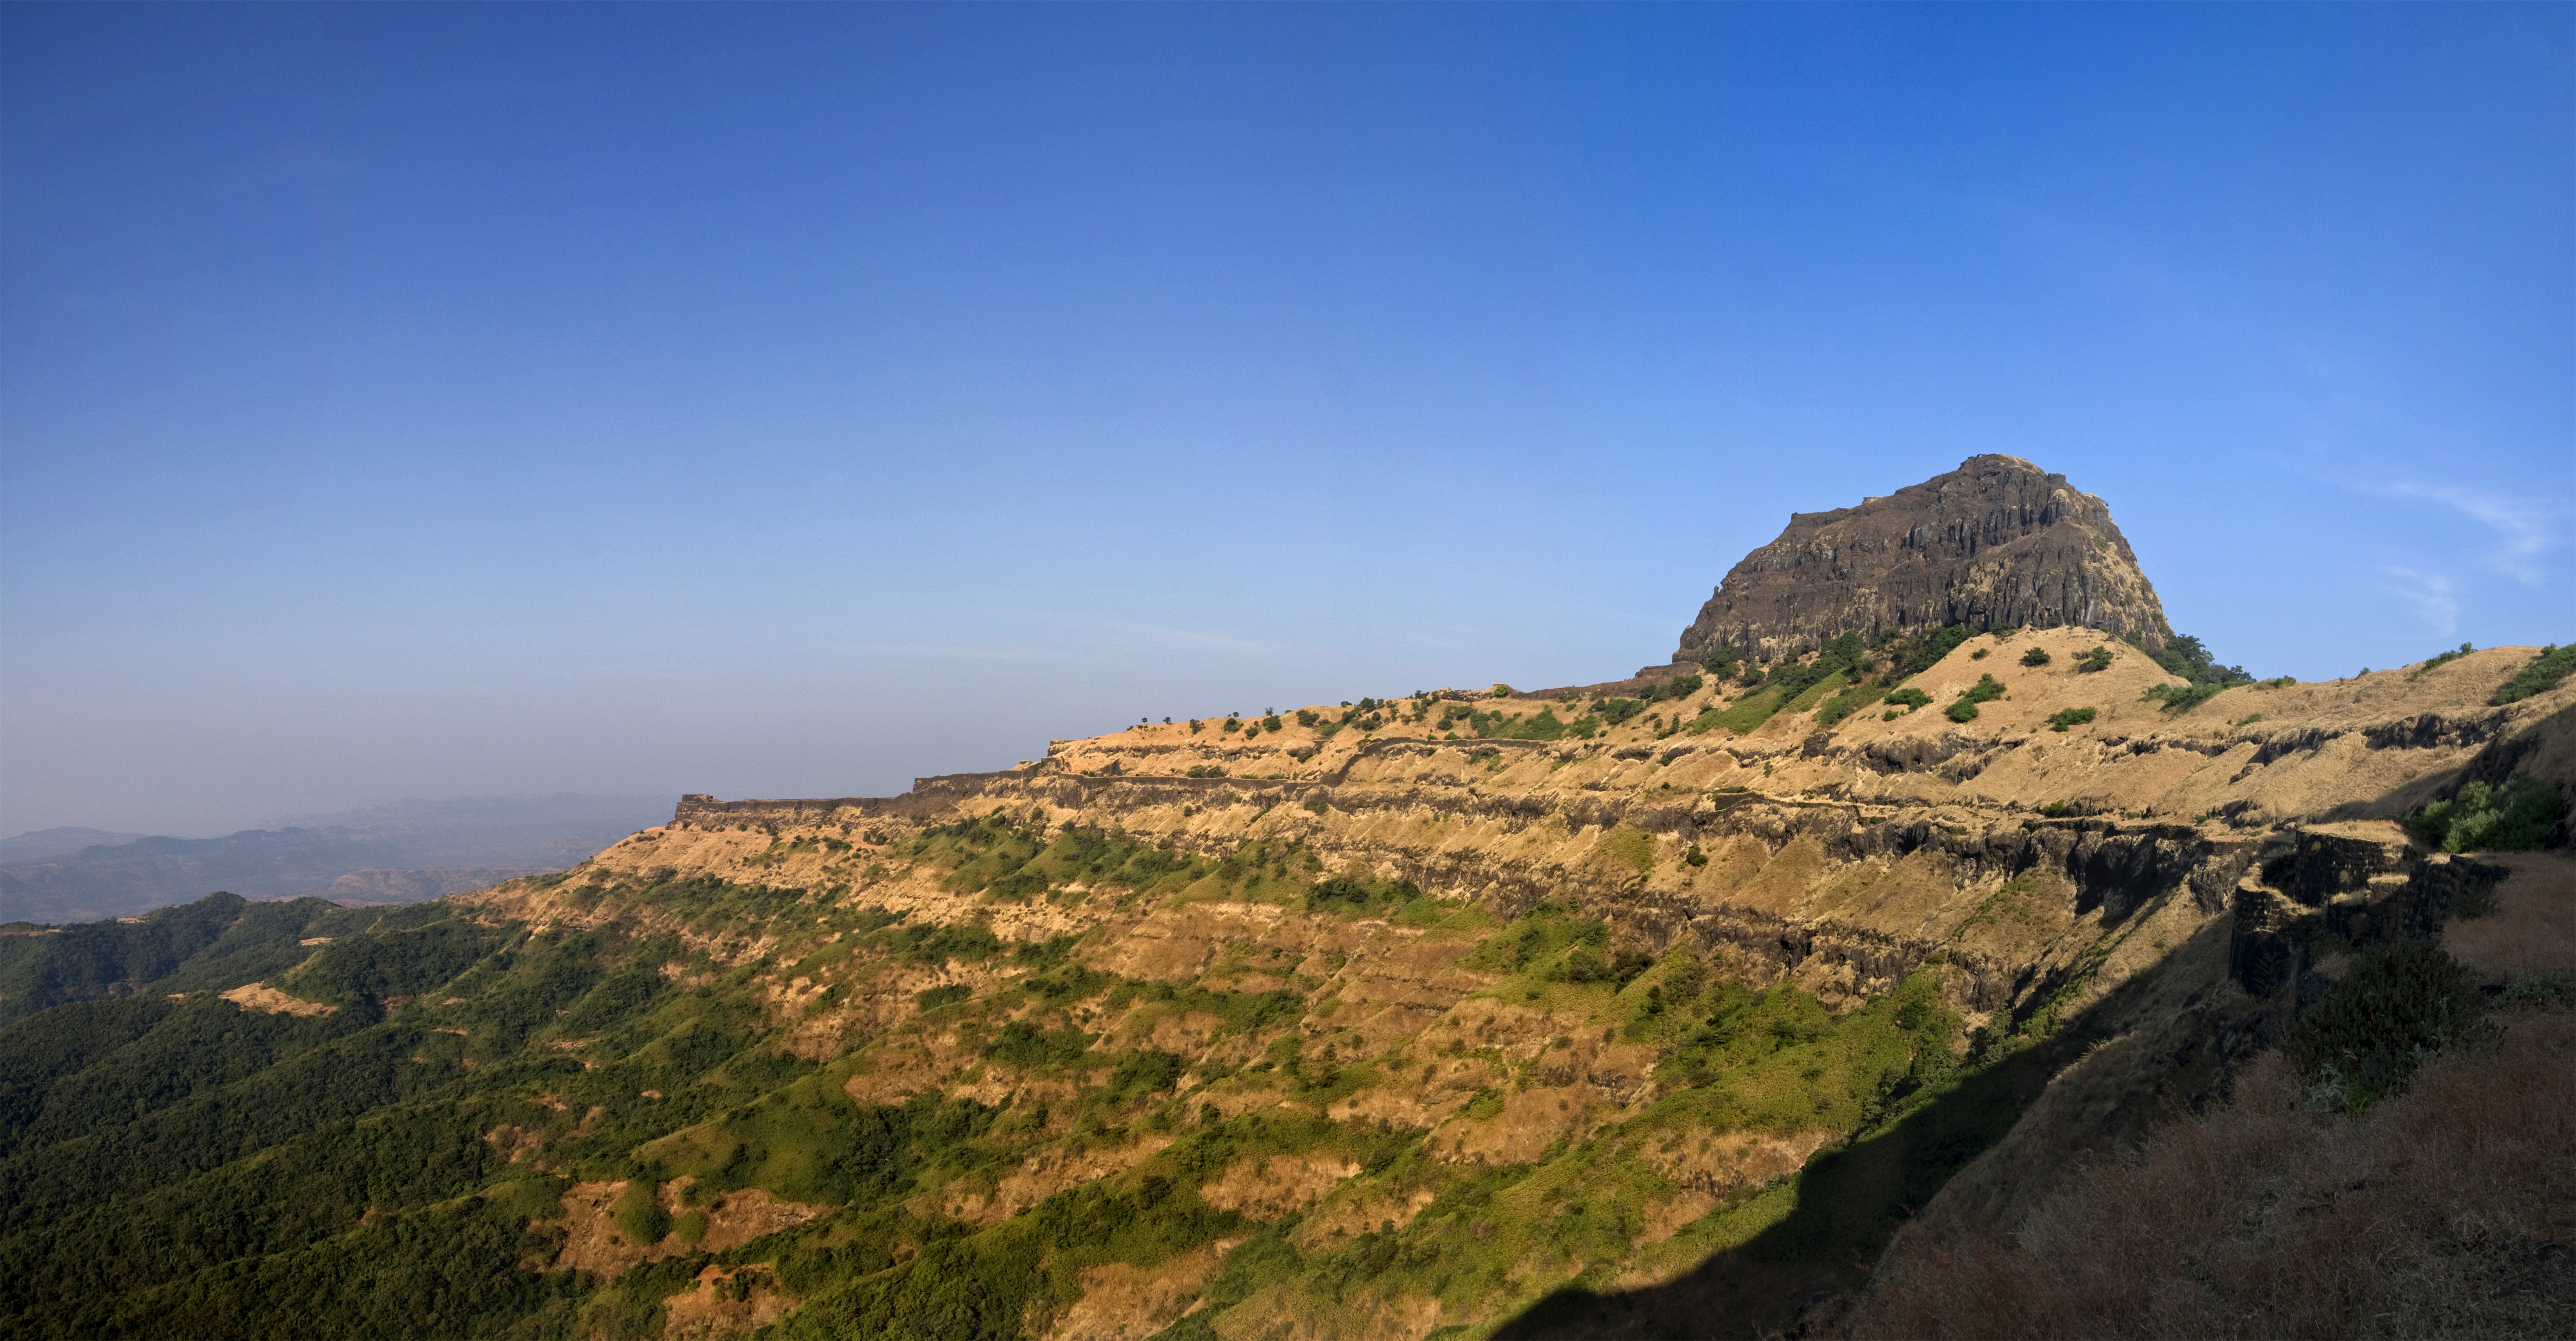 https://upload.wikimedia.org/wikipedia/commons/7/73/Bali_Khila_Rajgad_Maharashtra.jpg